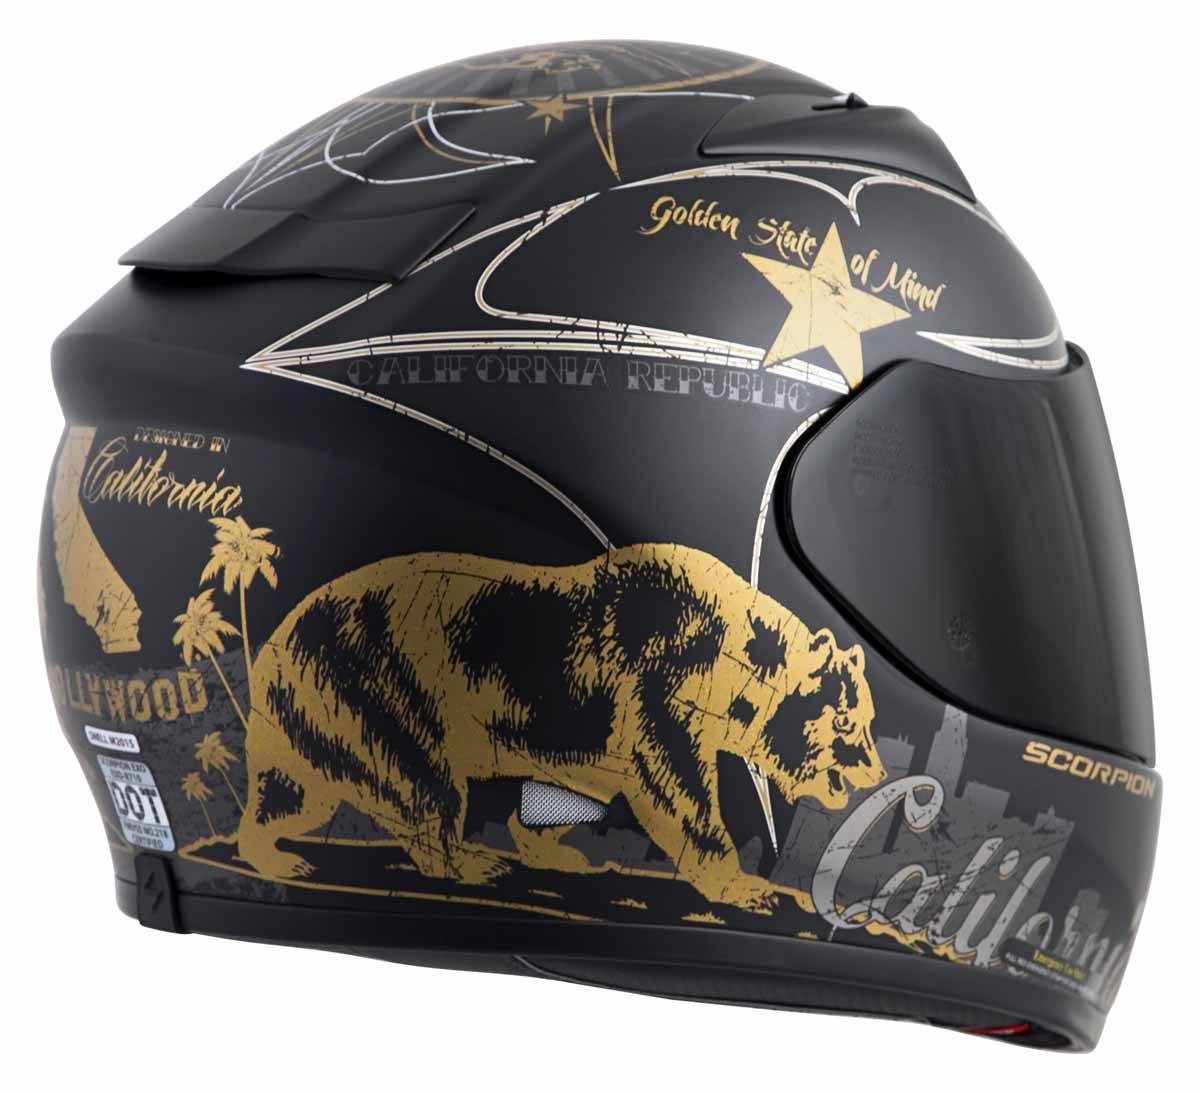 Scorpion-EXO-R710-Helmet-Fiberglass-Full-Face-DOT-SNELL-M2015-Certified-XS-2XL miniature 37